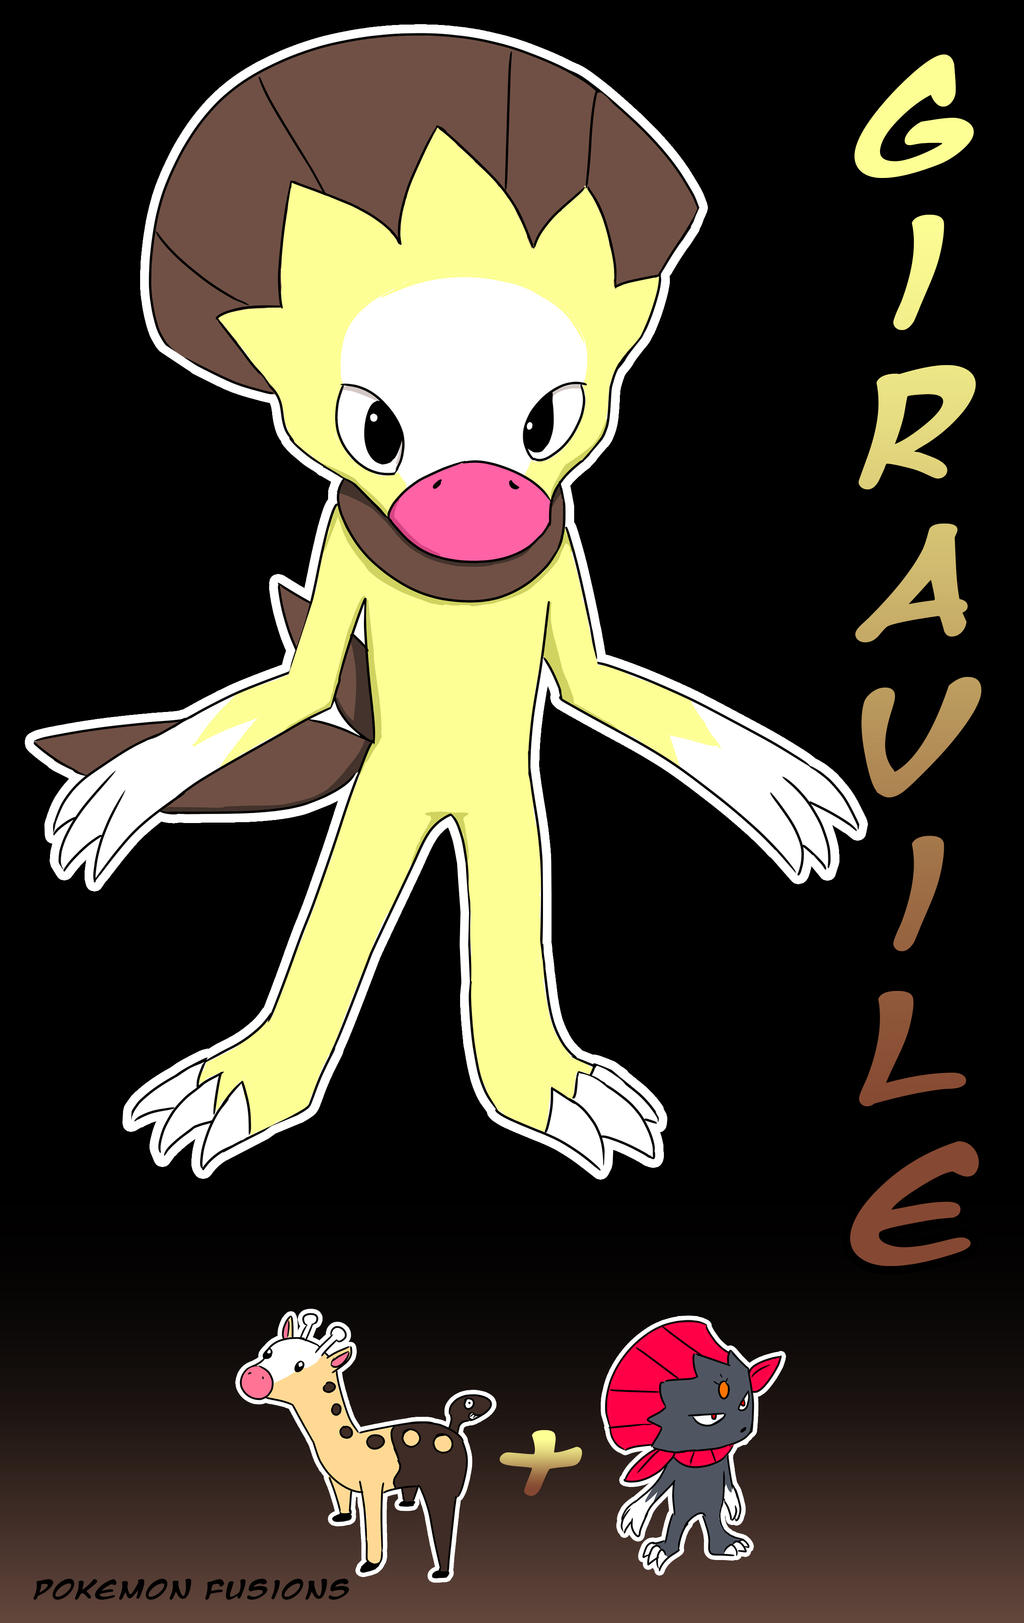 Pokemon Fusions #1 - Giravile by Kuribelle